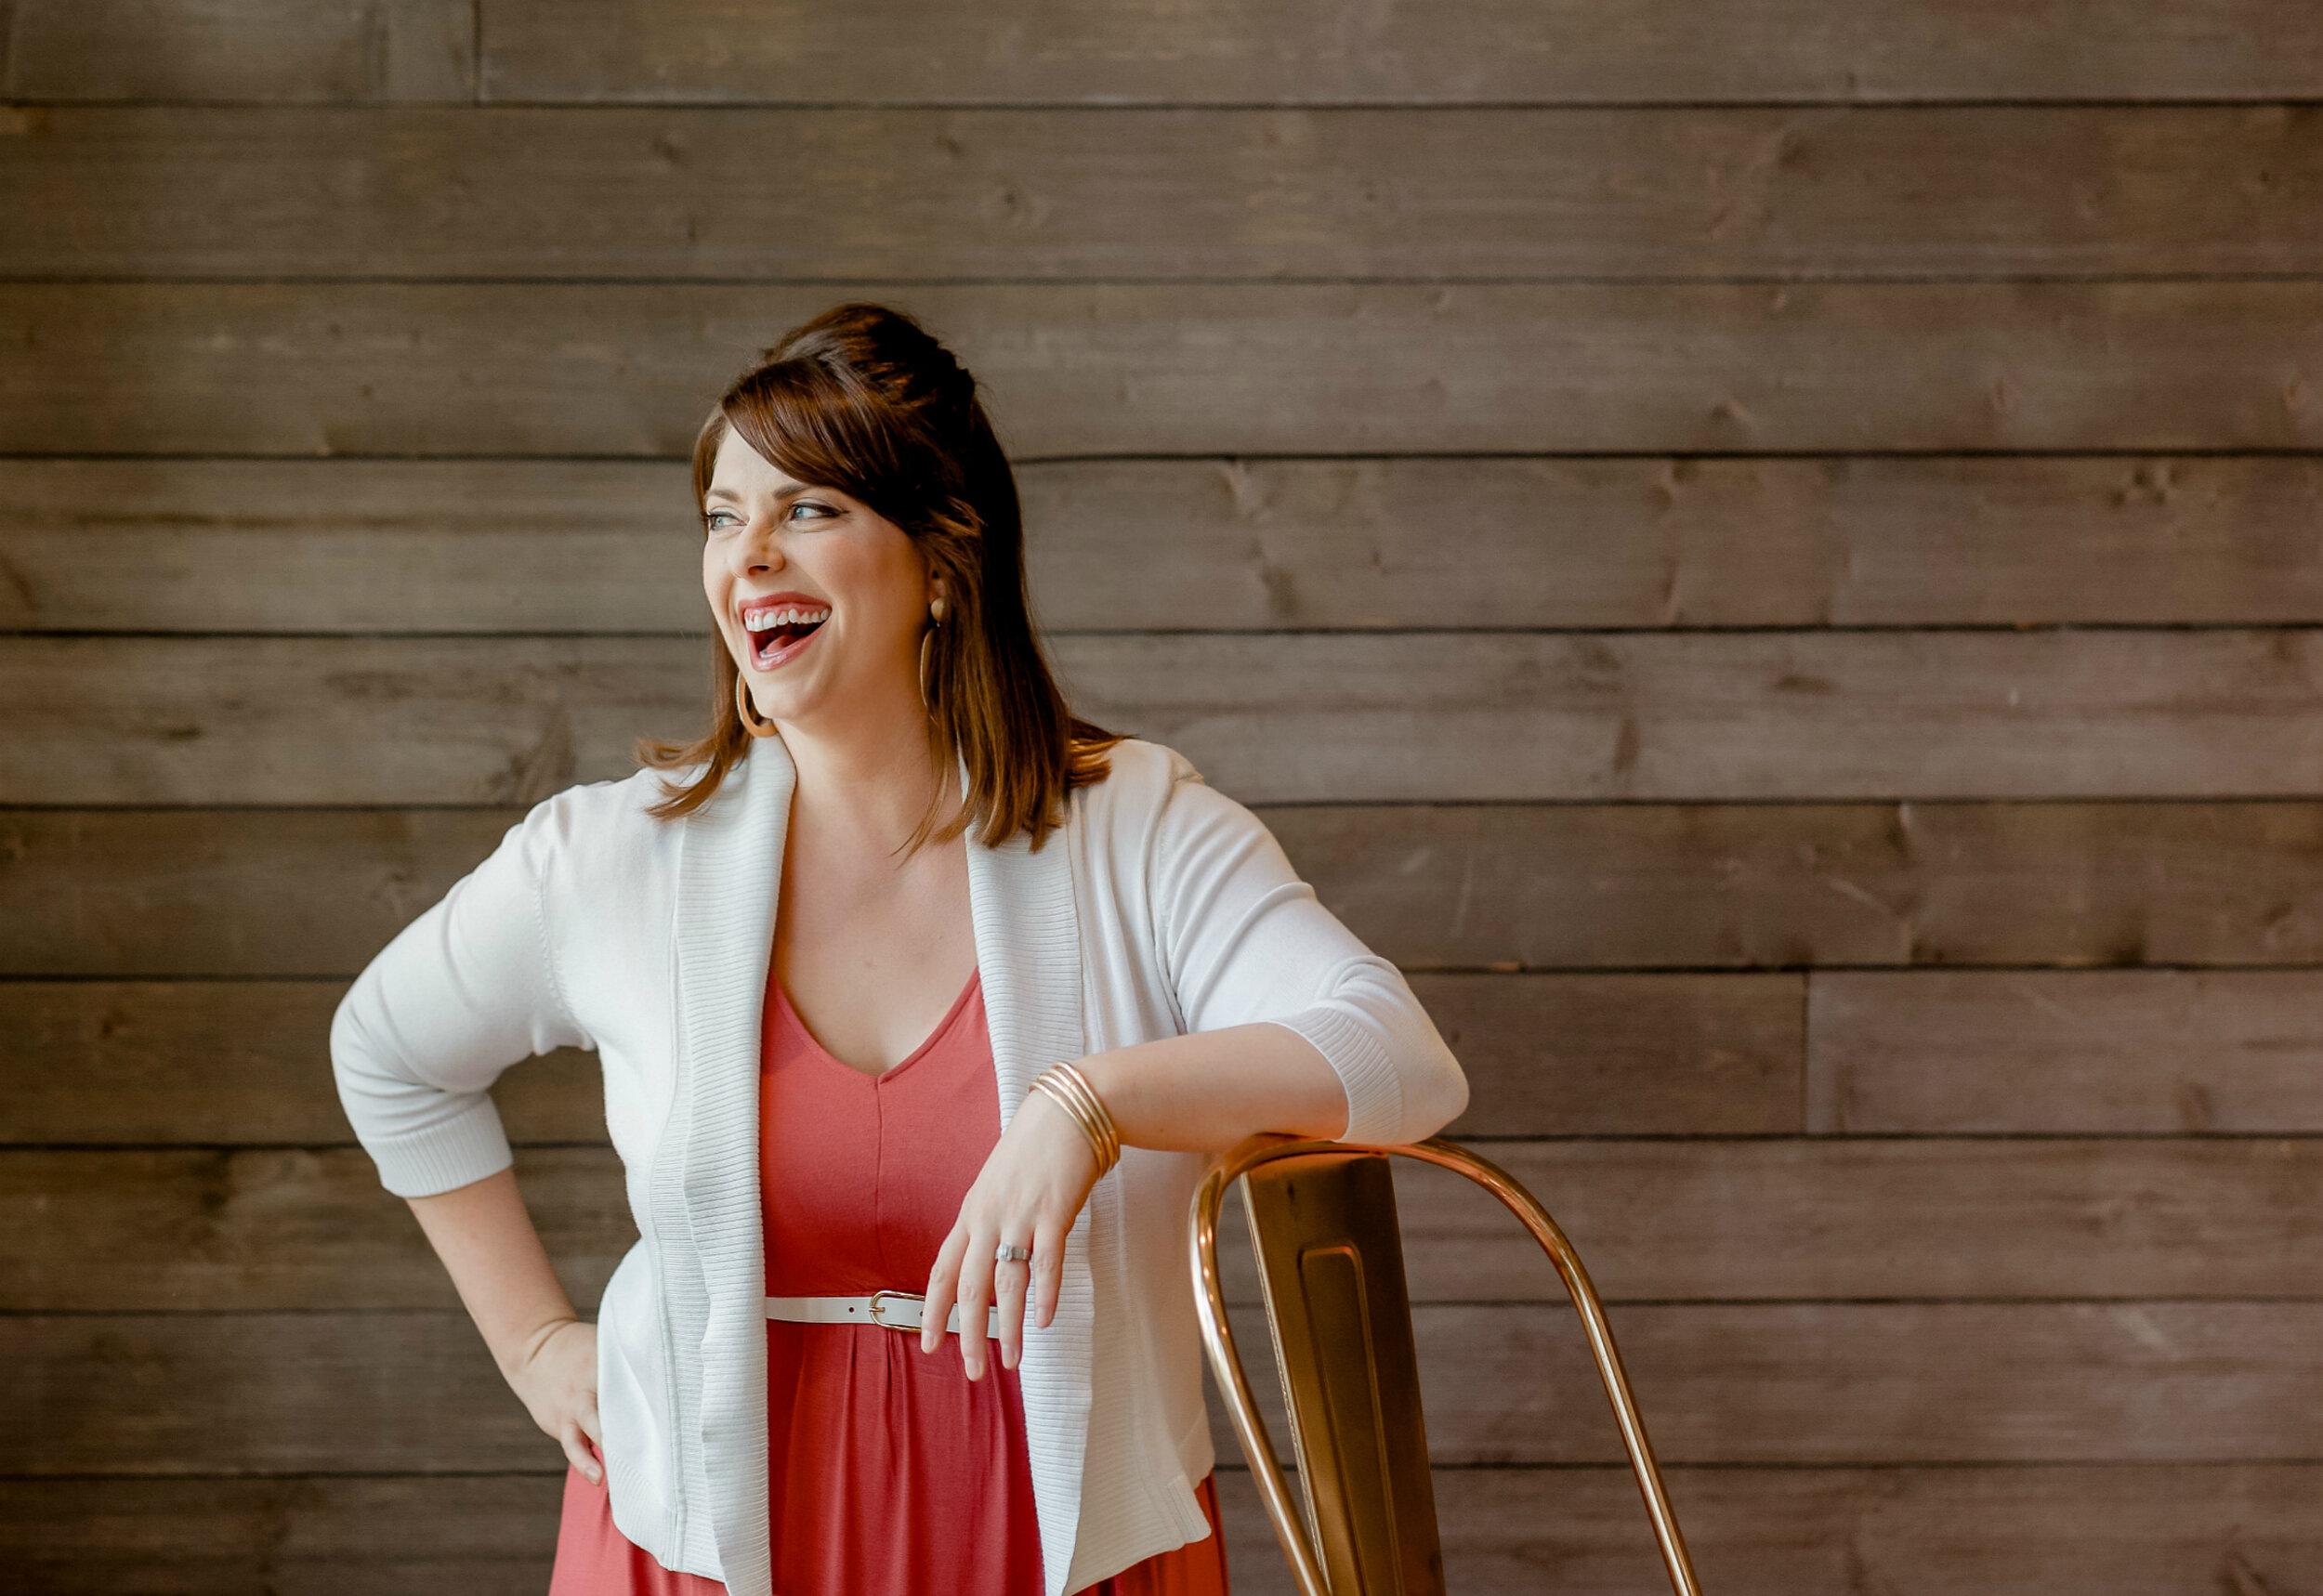 Laura Robinson, Lead Photographer